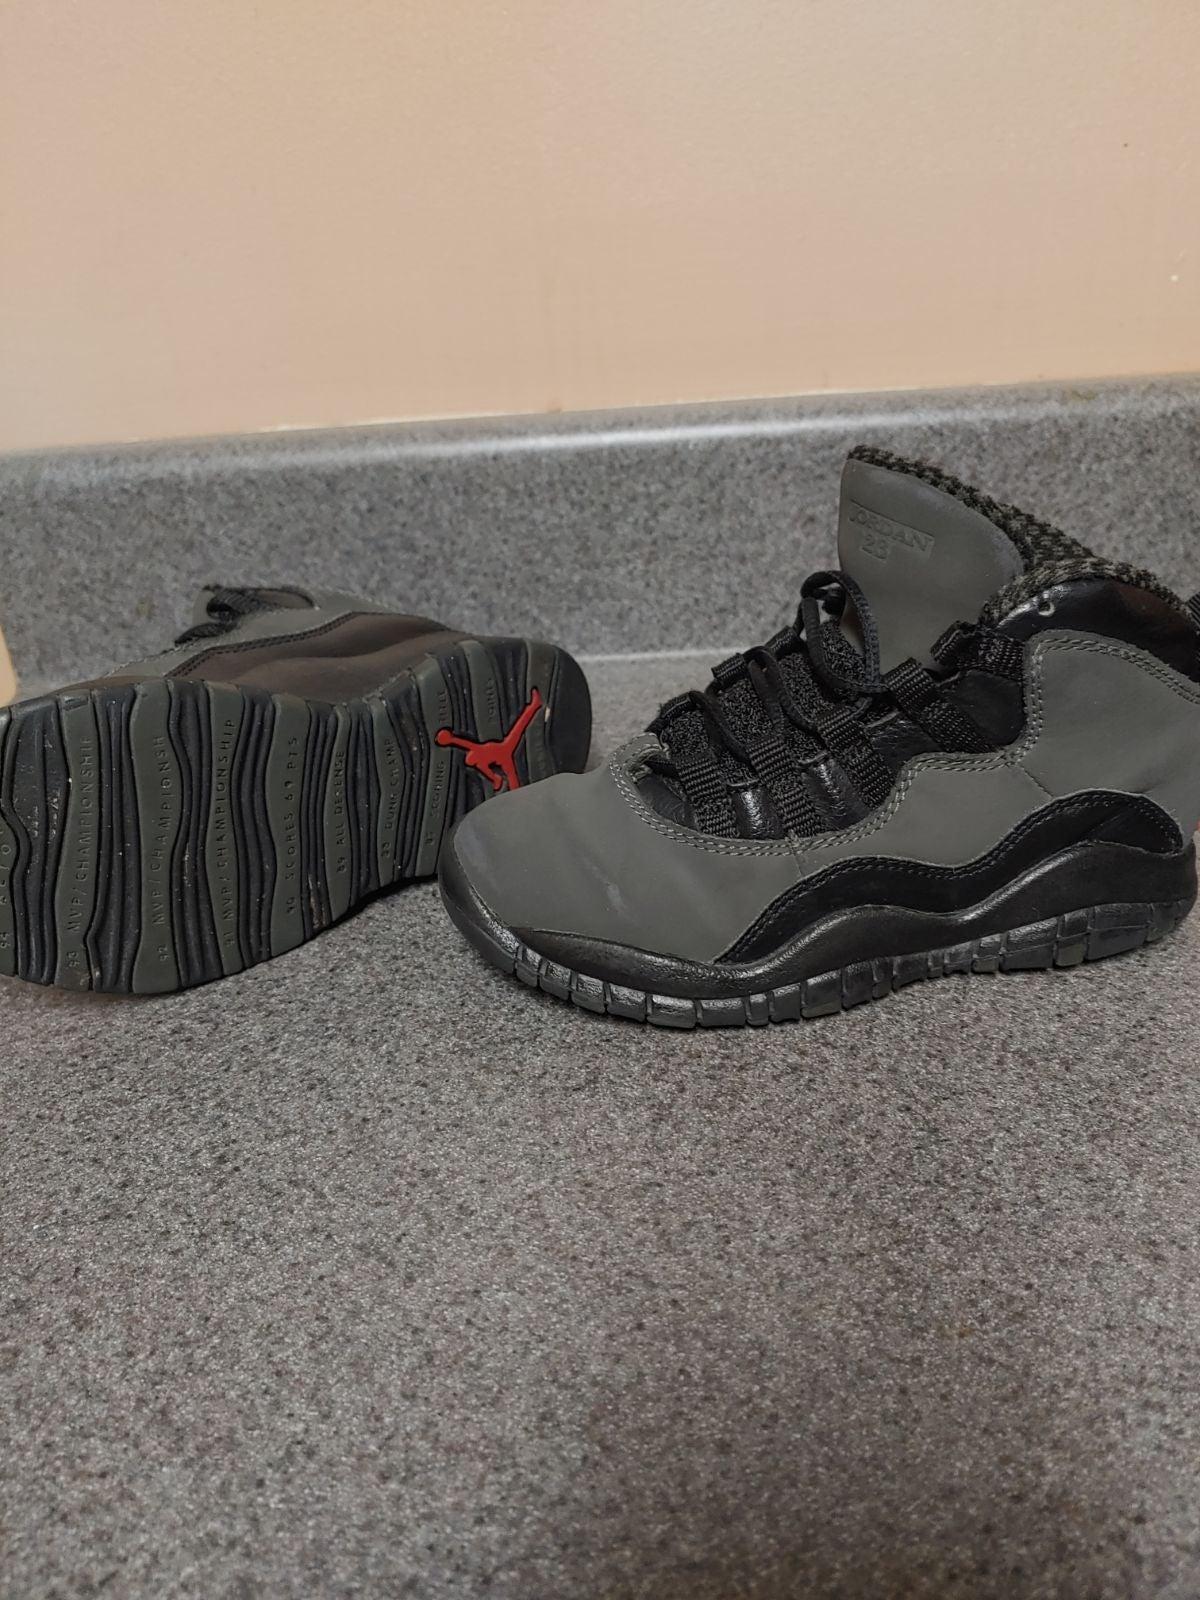 Air Jordan 10 retro shadow size 11c